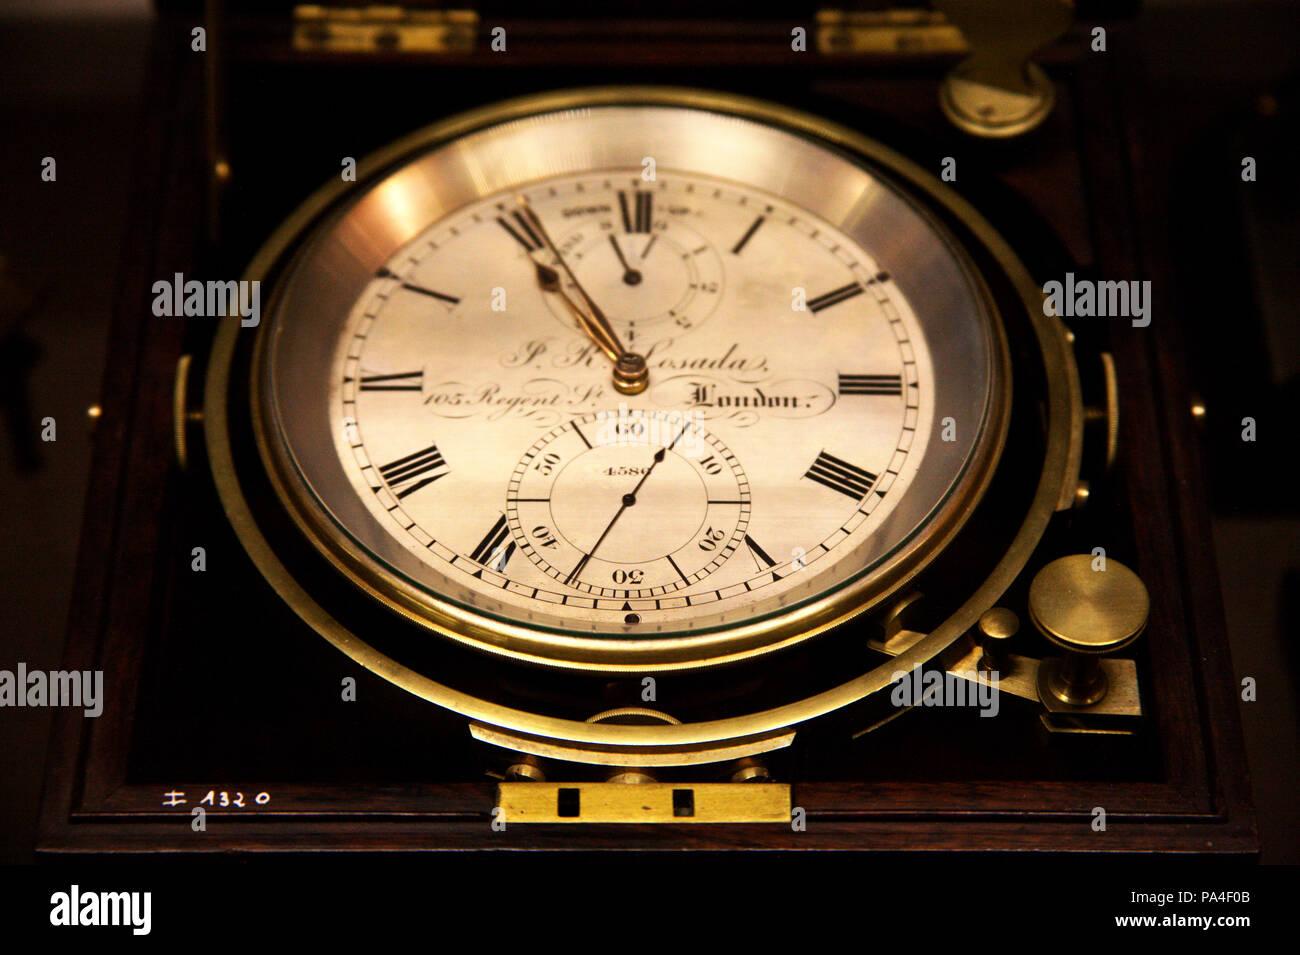 Marine chronometer, 18th-19th century, Europe - Stock Image